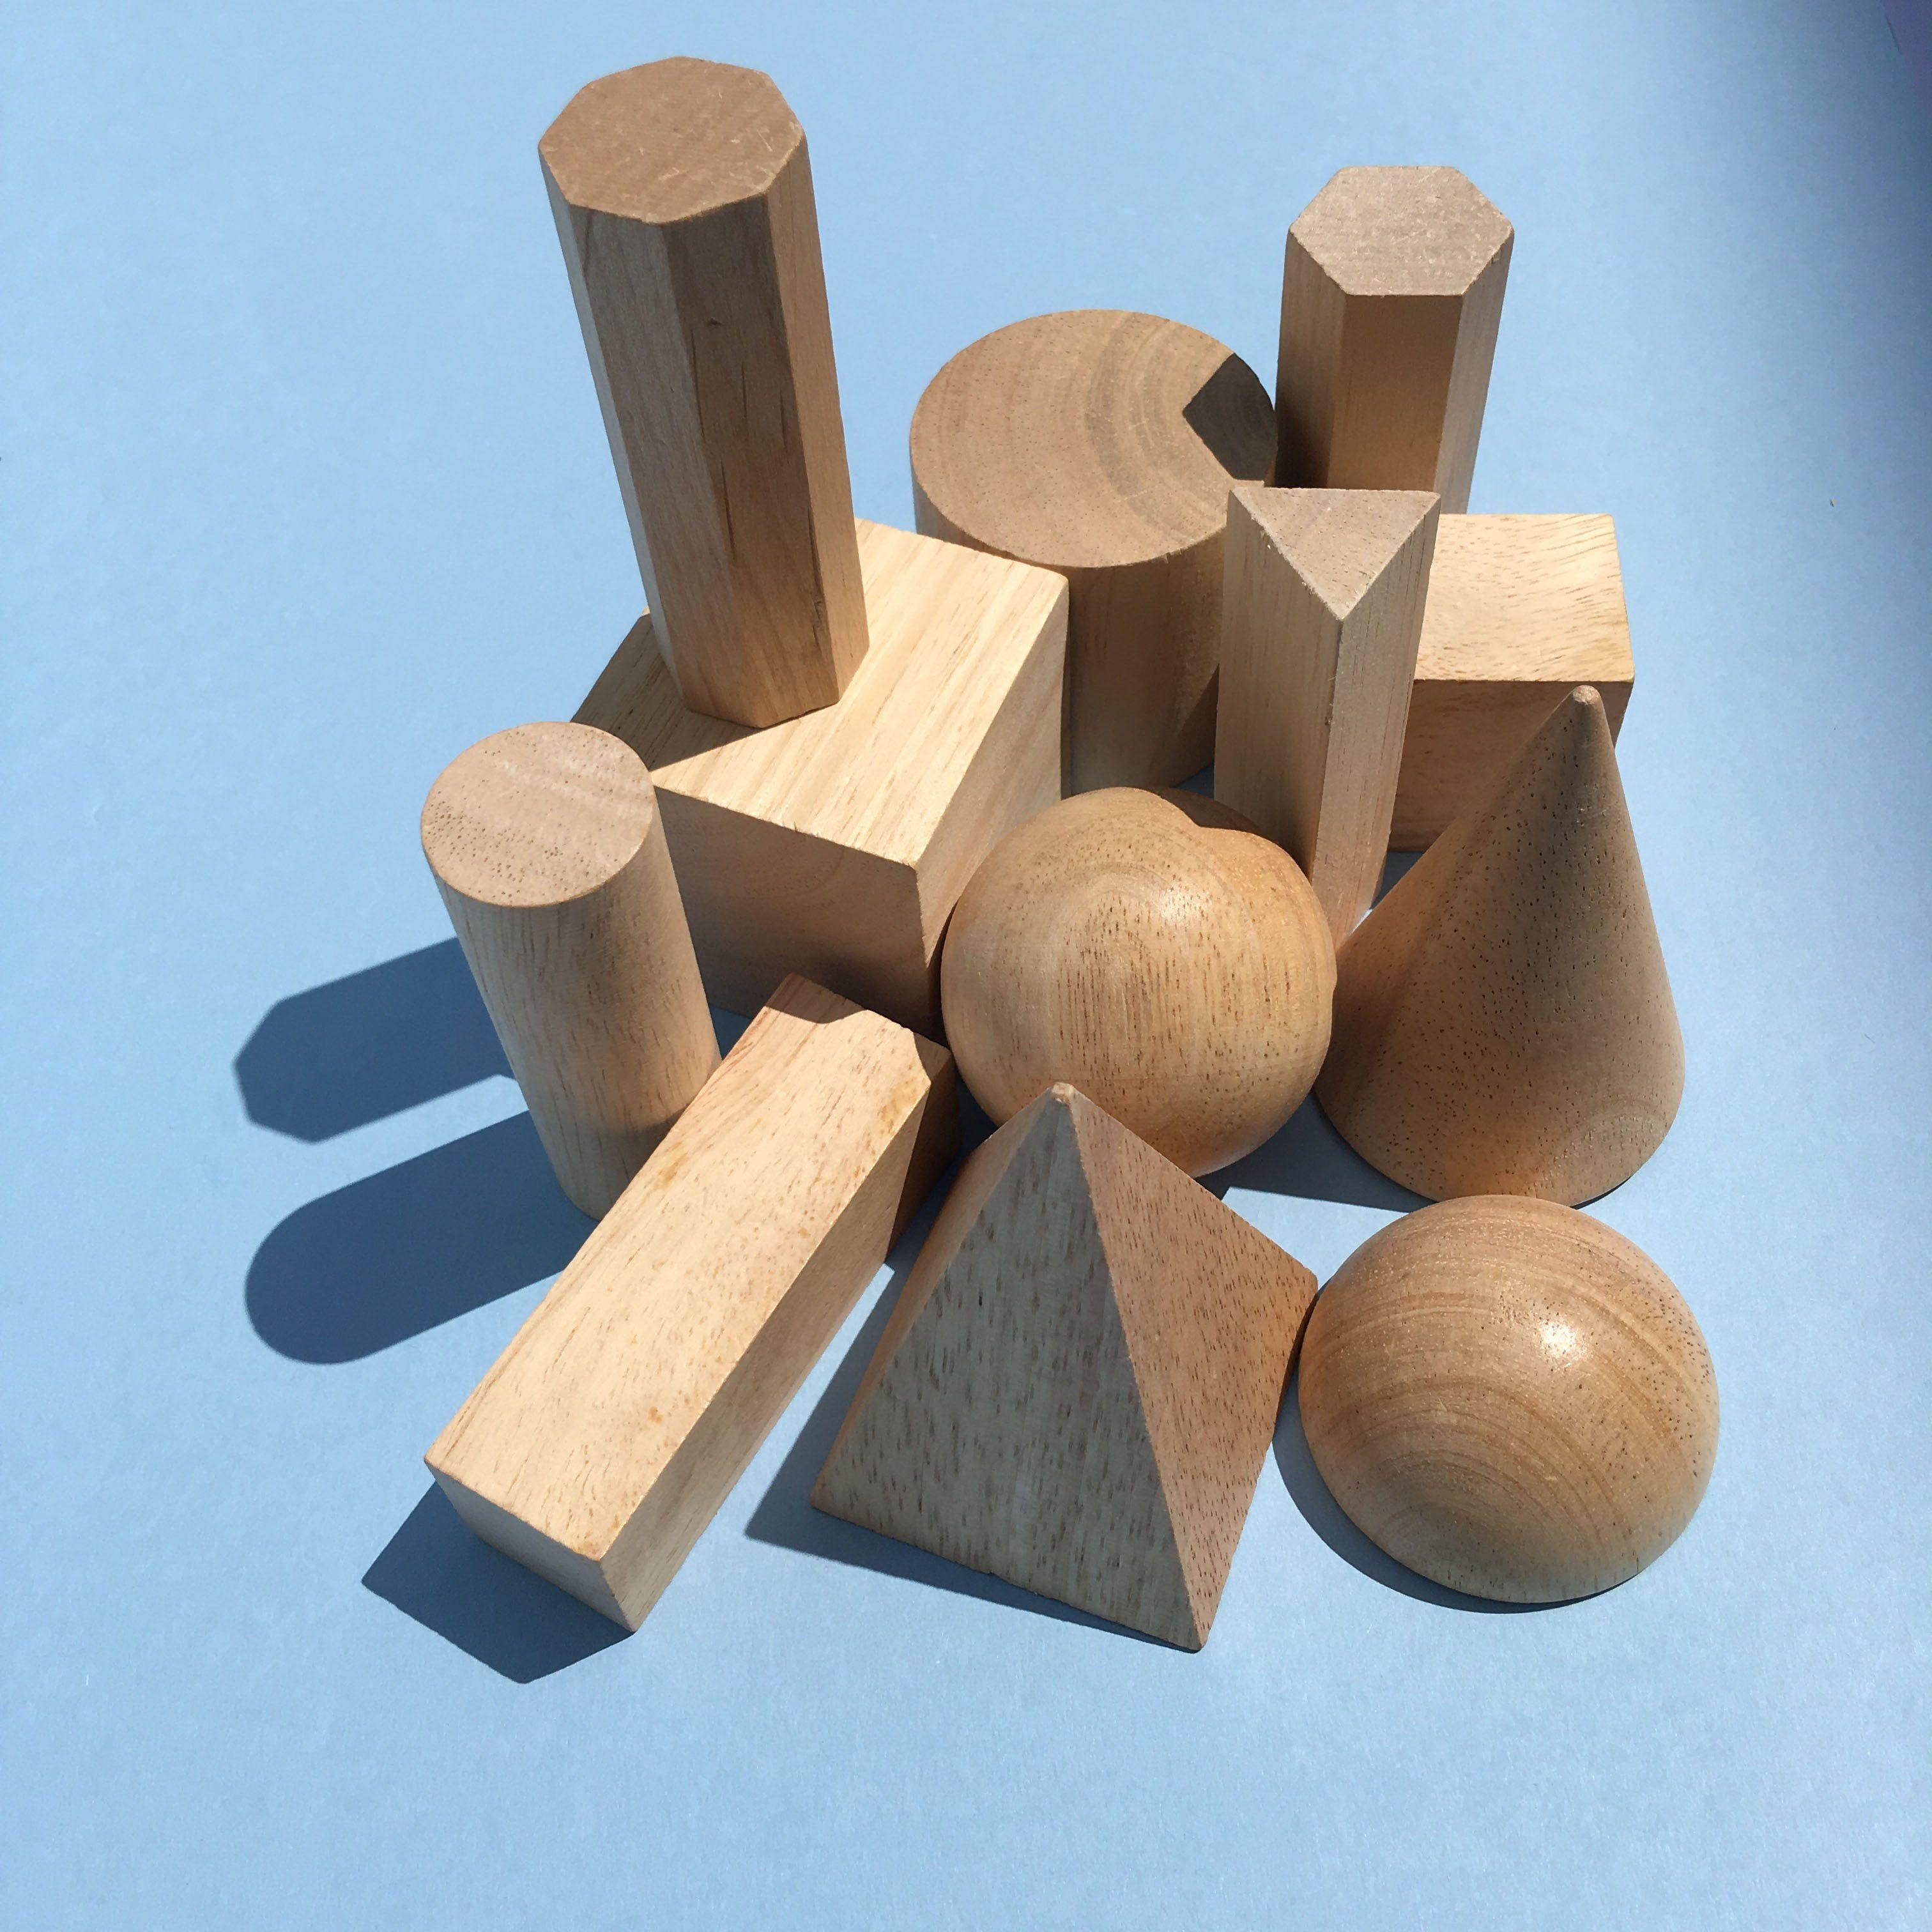 Wood Geometric Solids 12 Piece Set